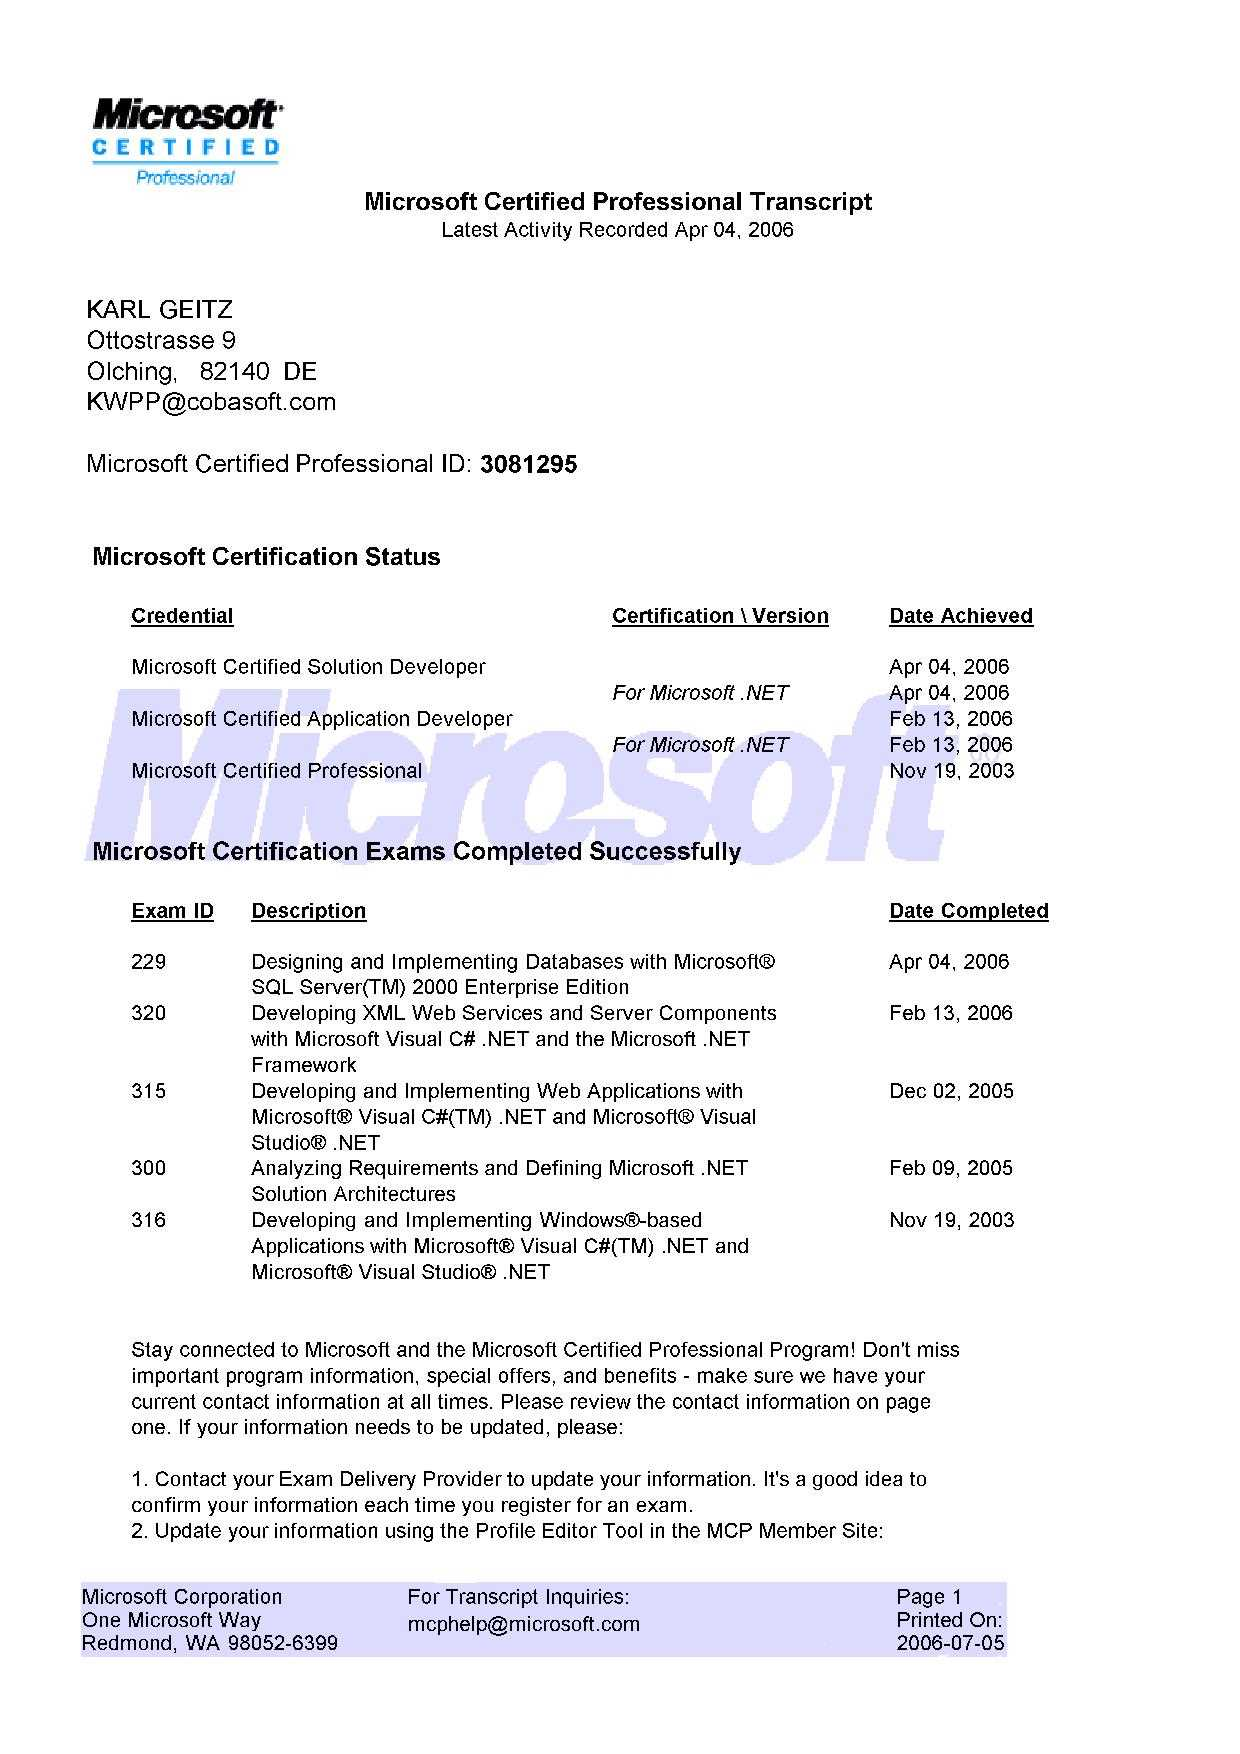 Cobasoft professional software development mcp transcript mcad certificate mcp certificate 1betcityfo Image collections